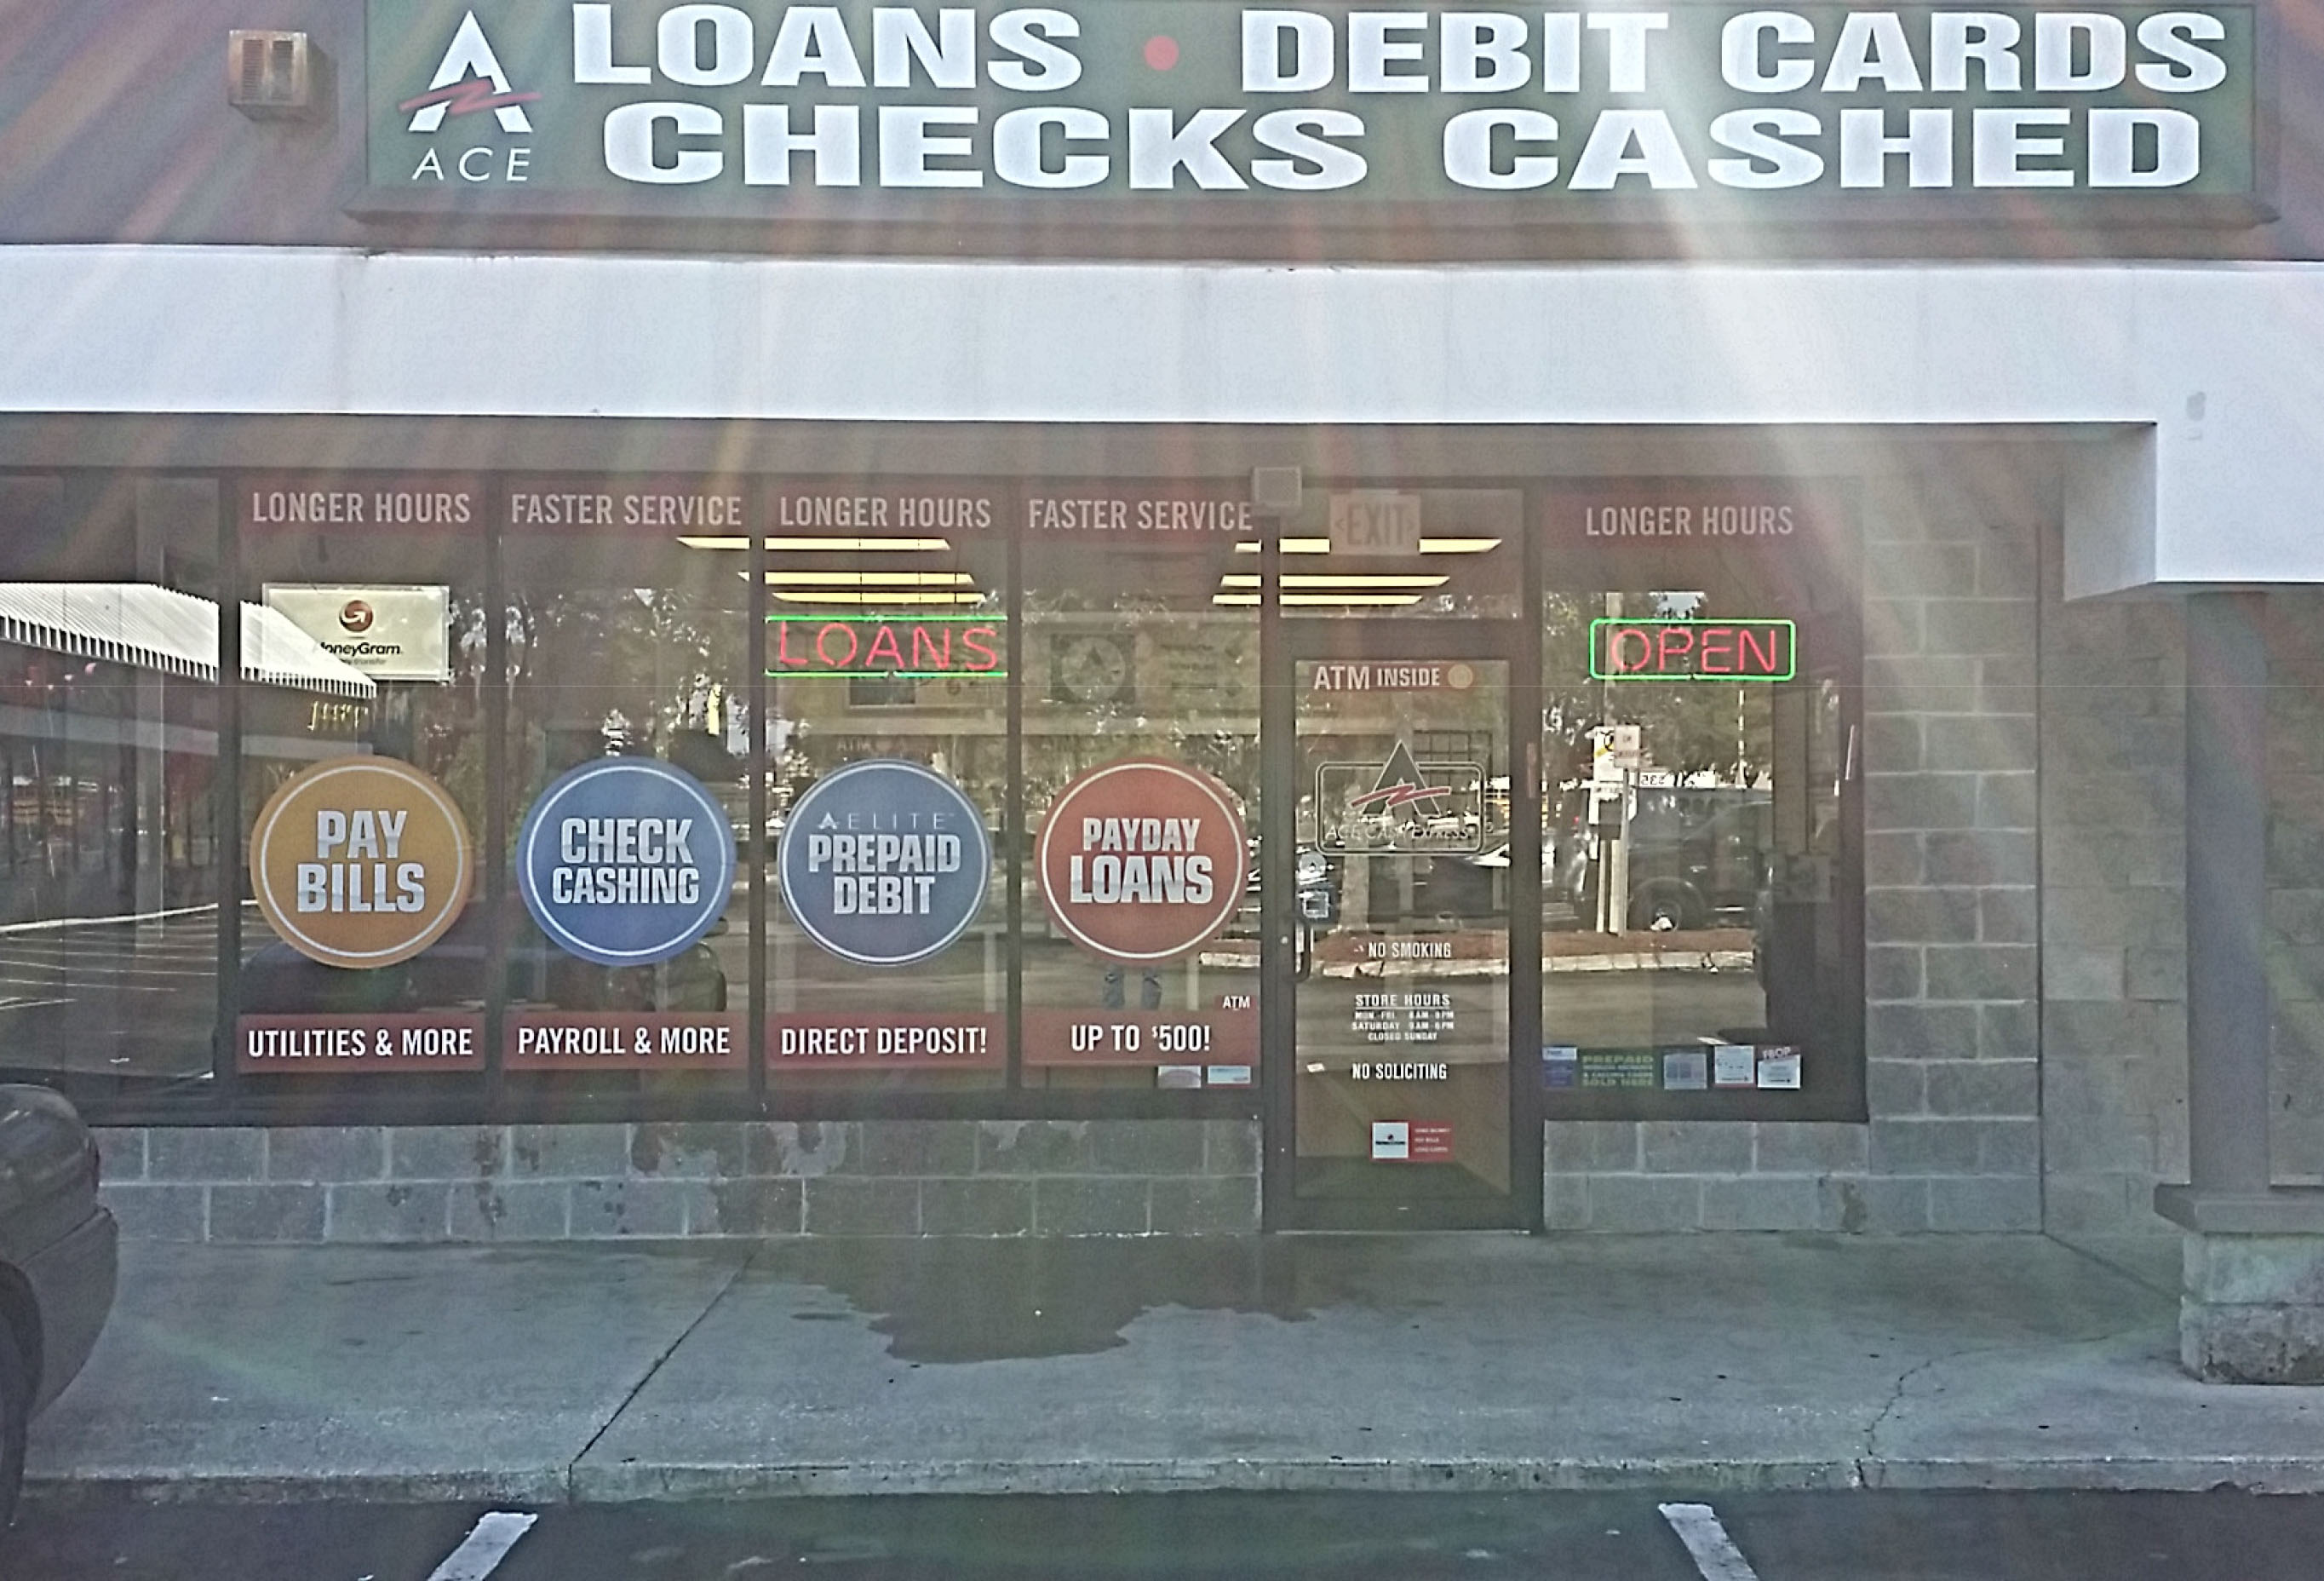 Fast cash loans usa image 2